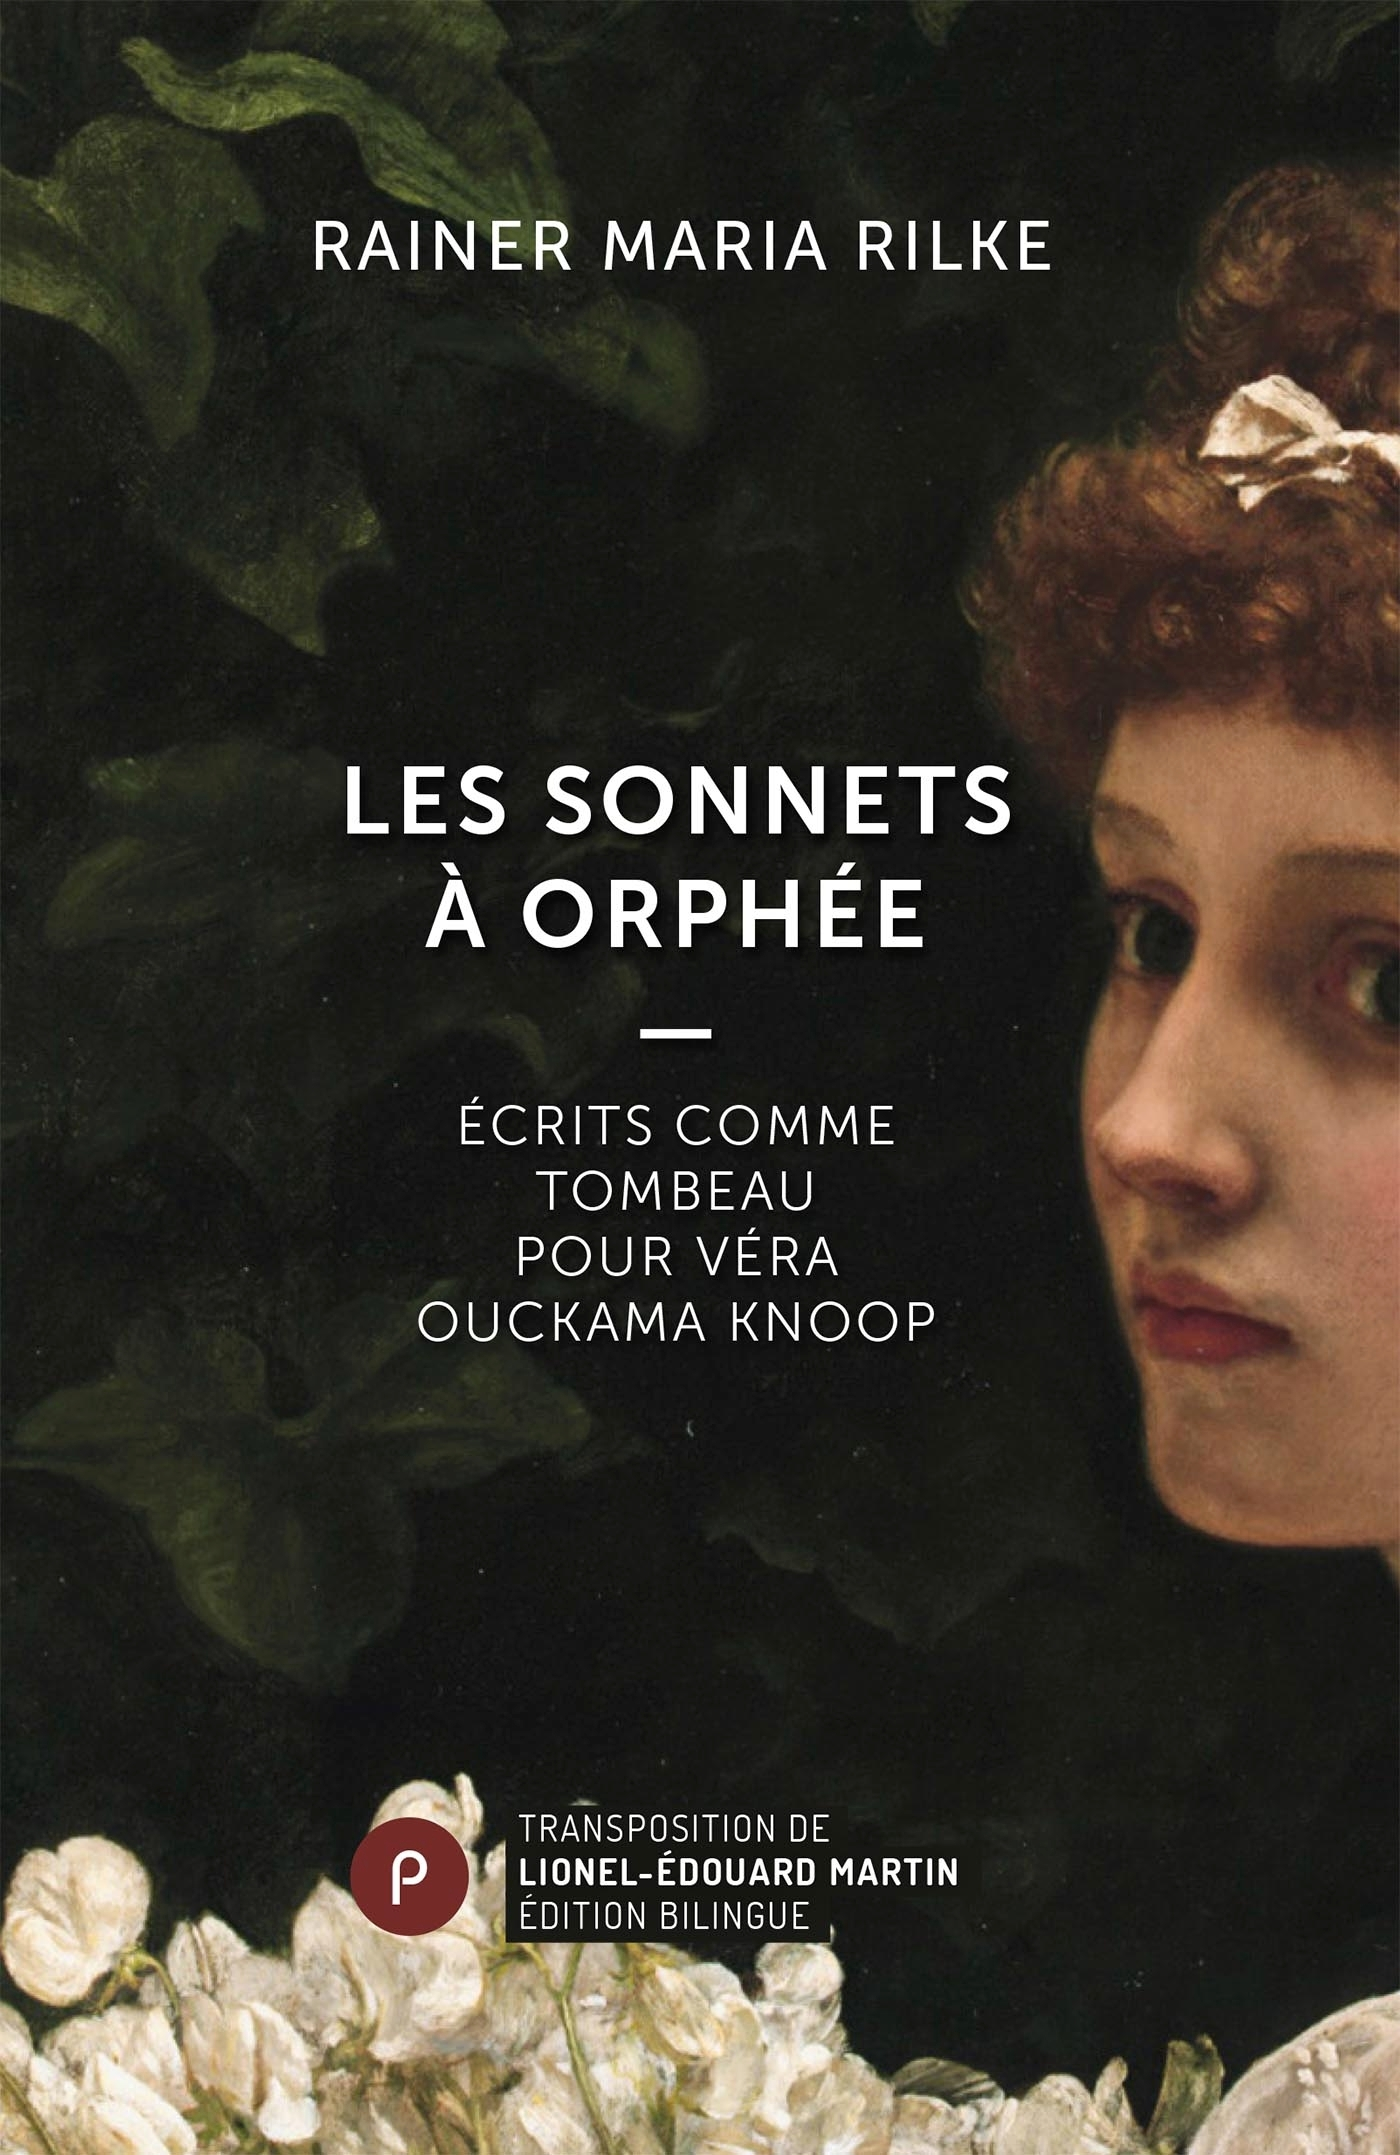 LES SONNETS A ORPHEE - ECRITS COMME TOMBEAU POUR VERA OUCKAMA KNOOP